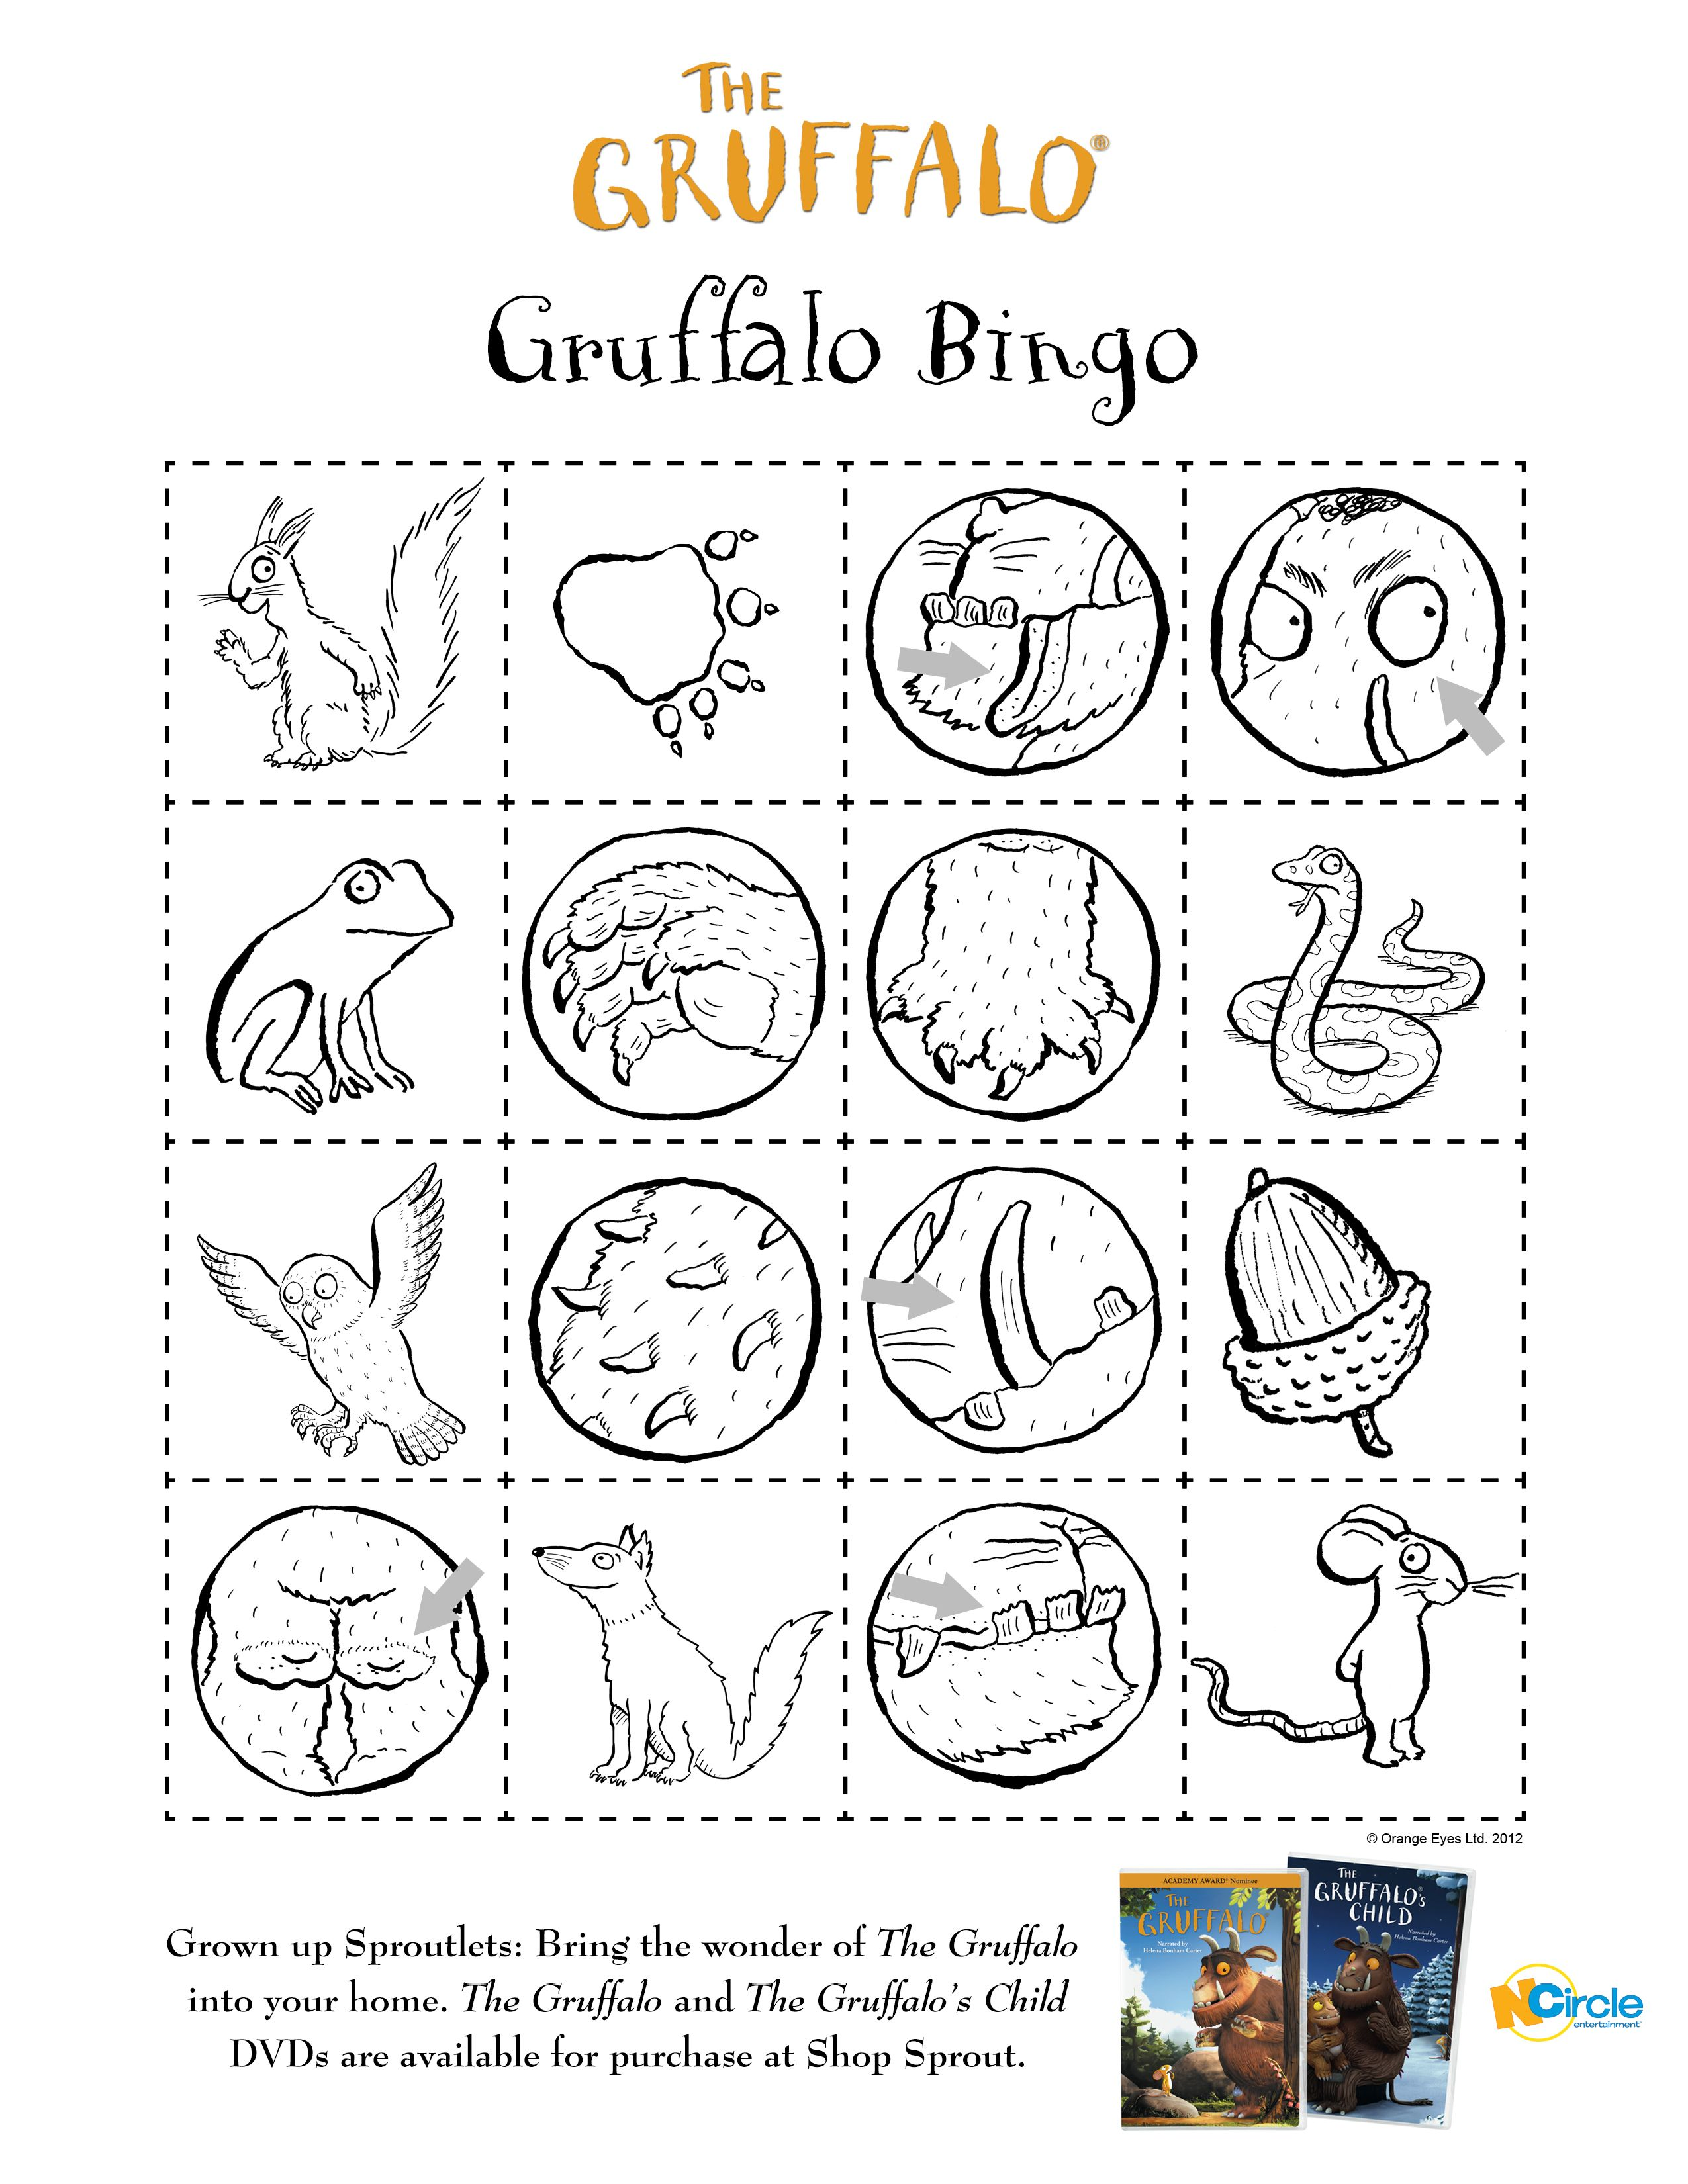 Gruffalo Colouring Sheets Printable Sketch Coloring Page